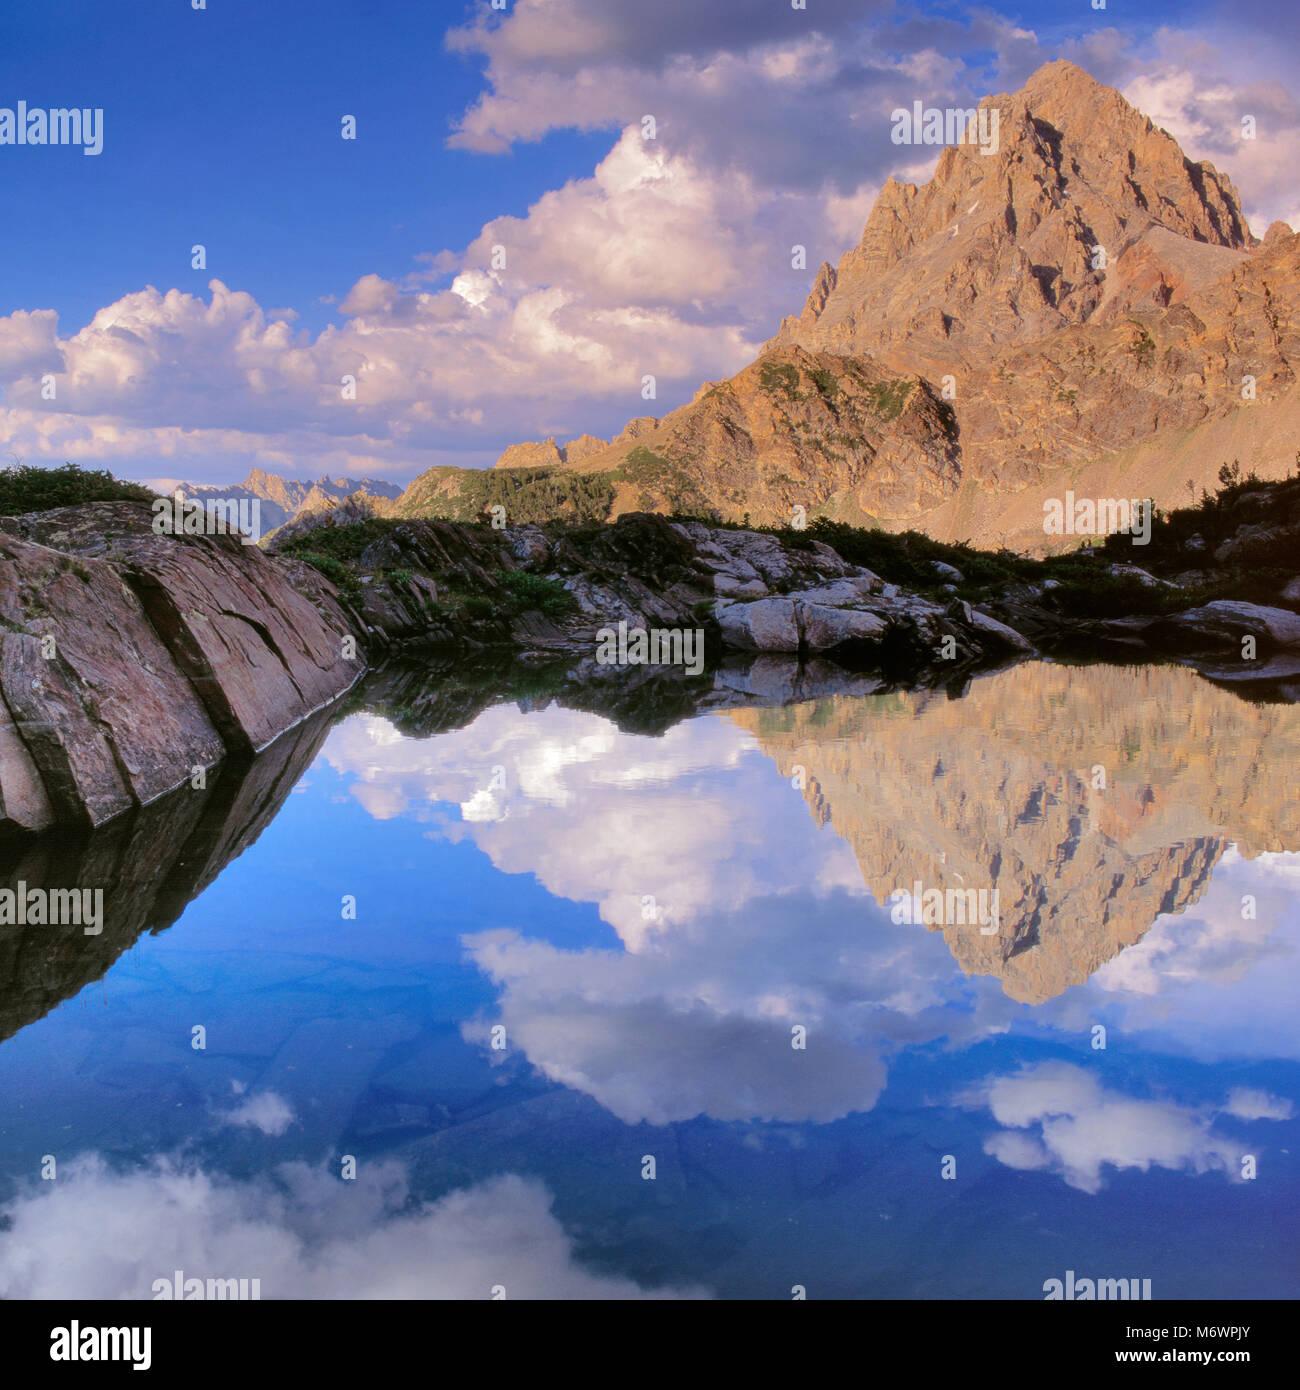 The Grand Teton, from Schoolroom Glacier area, Grand Teton National Park, Wyoming Stock Photo